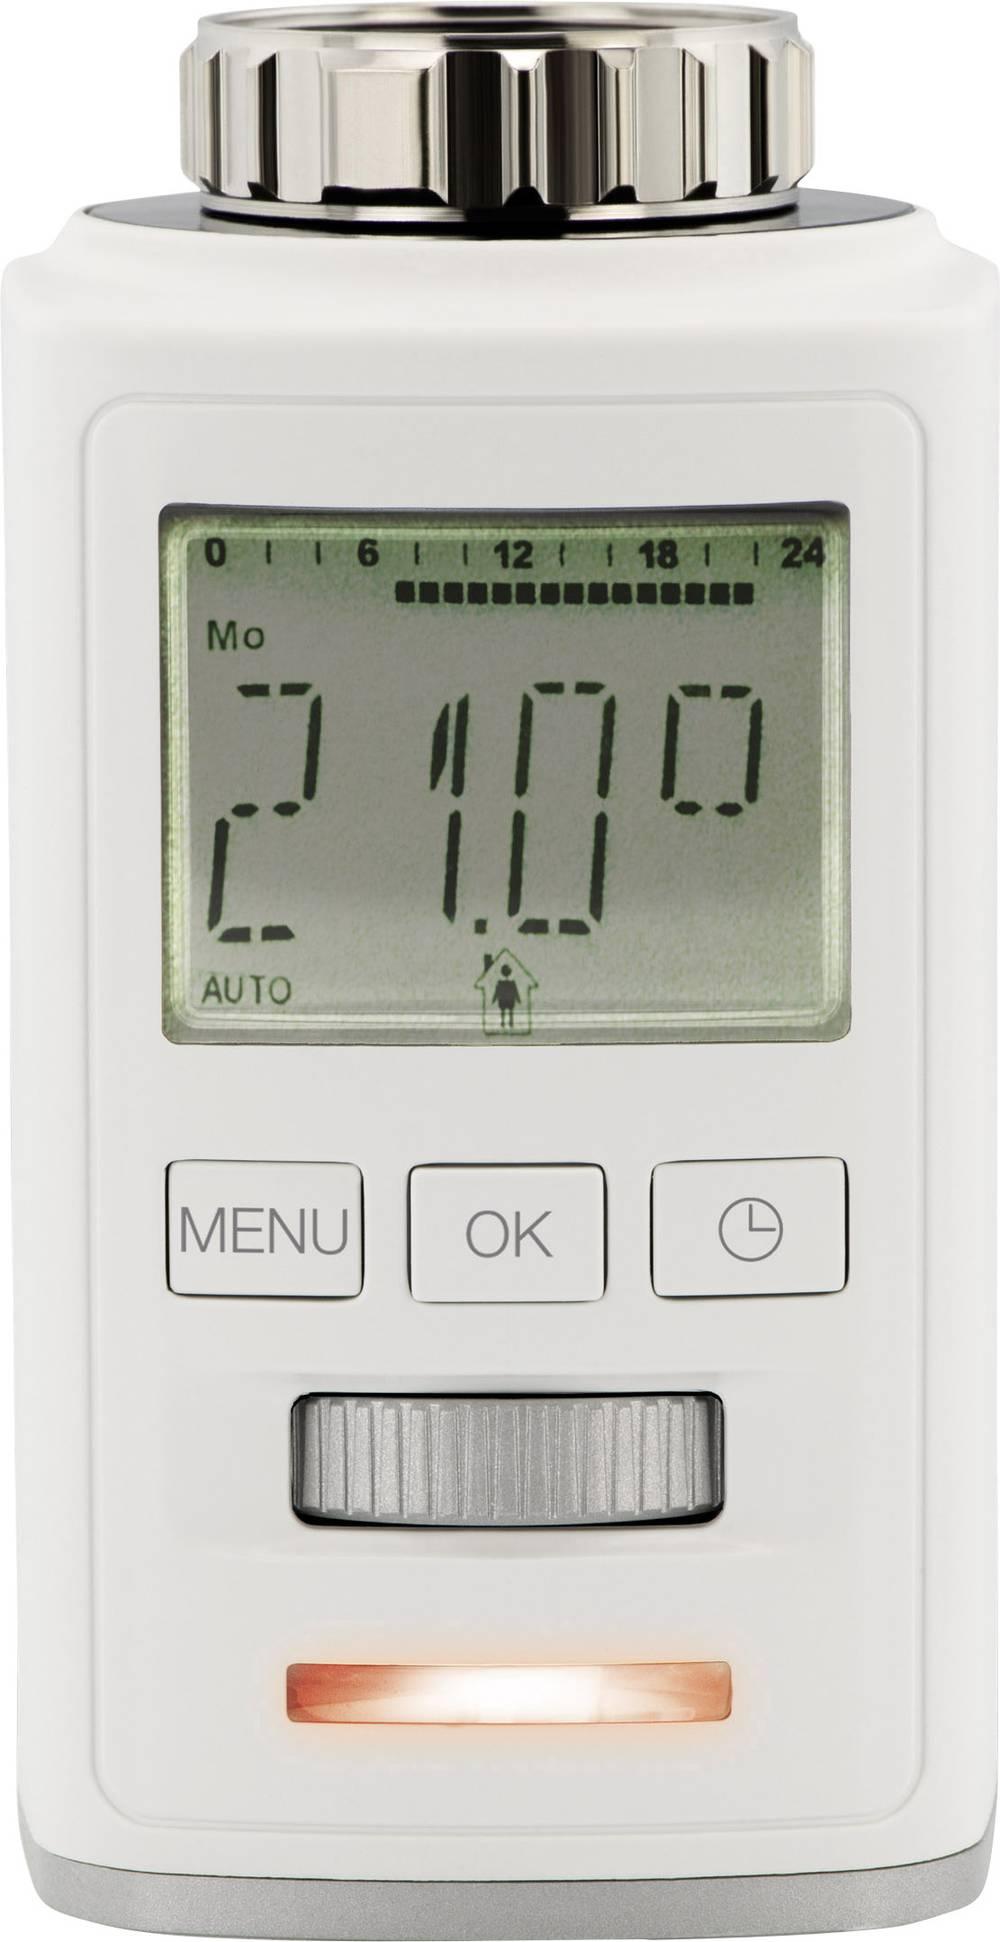 Radiatorski termostat Sygonix HT100, 8 do 28 °C